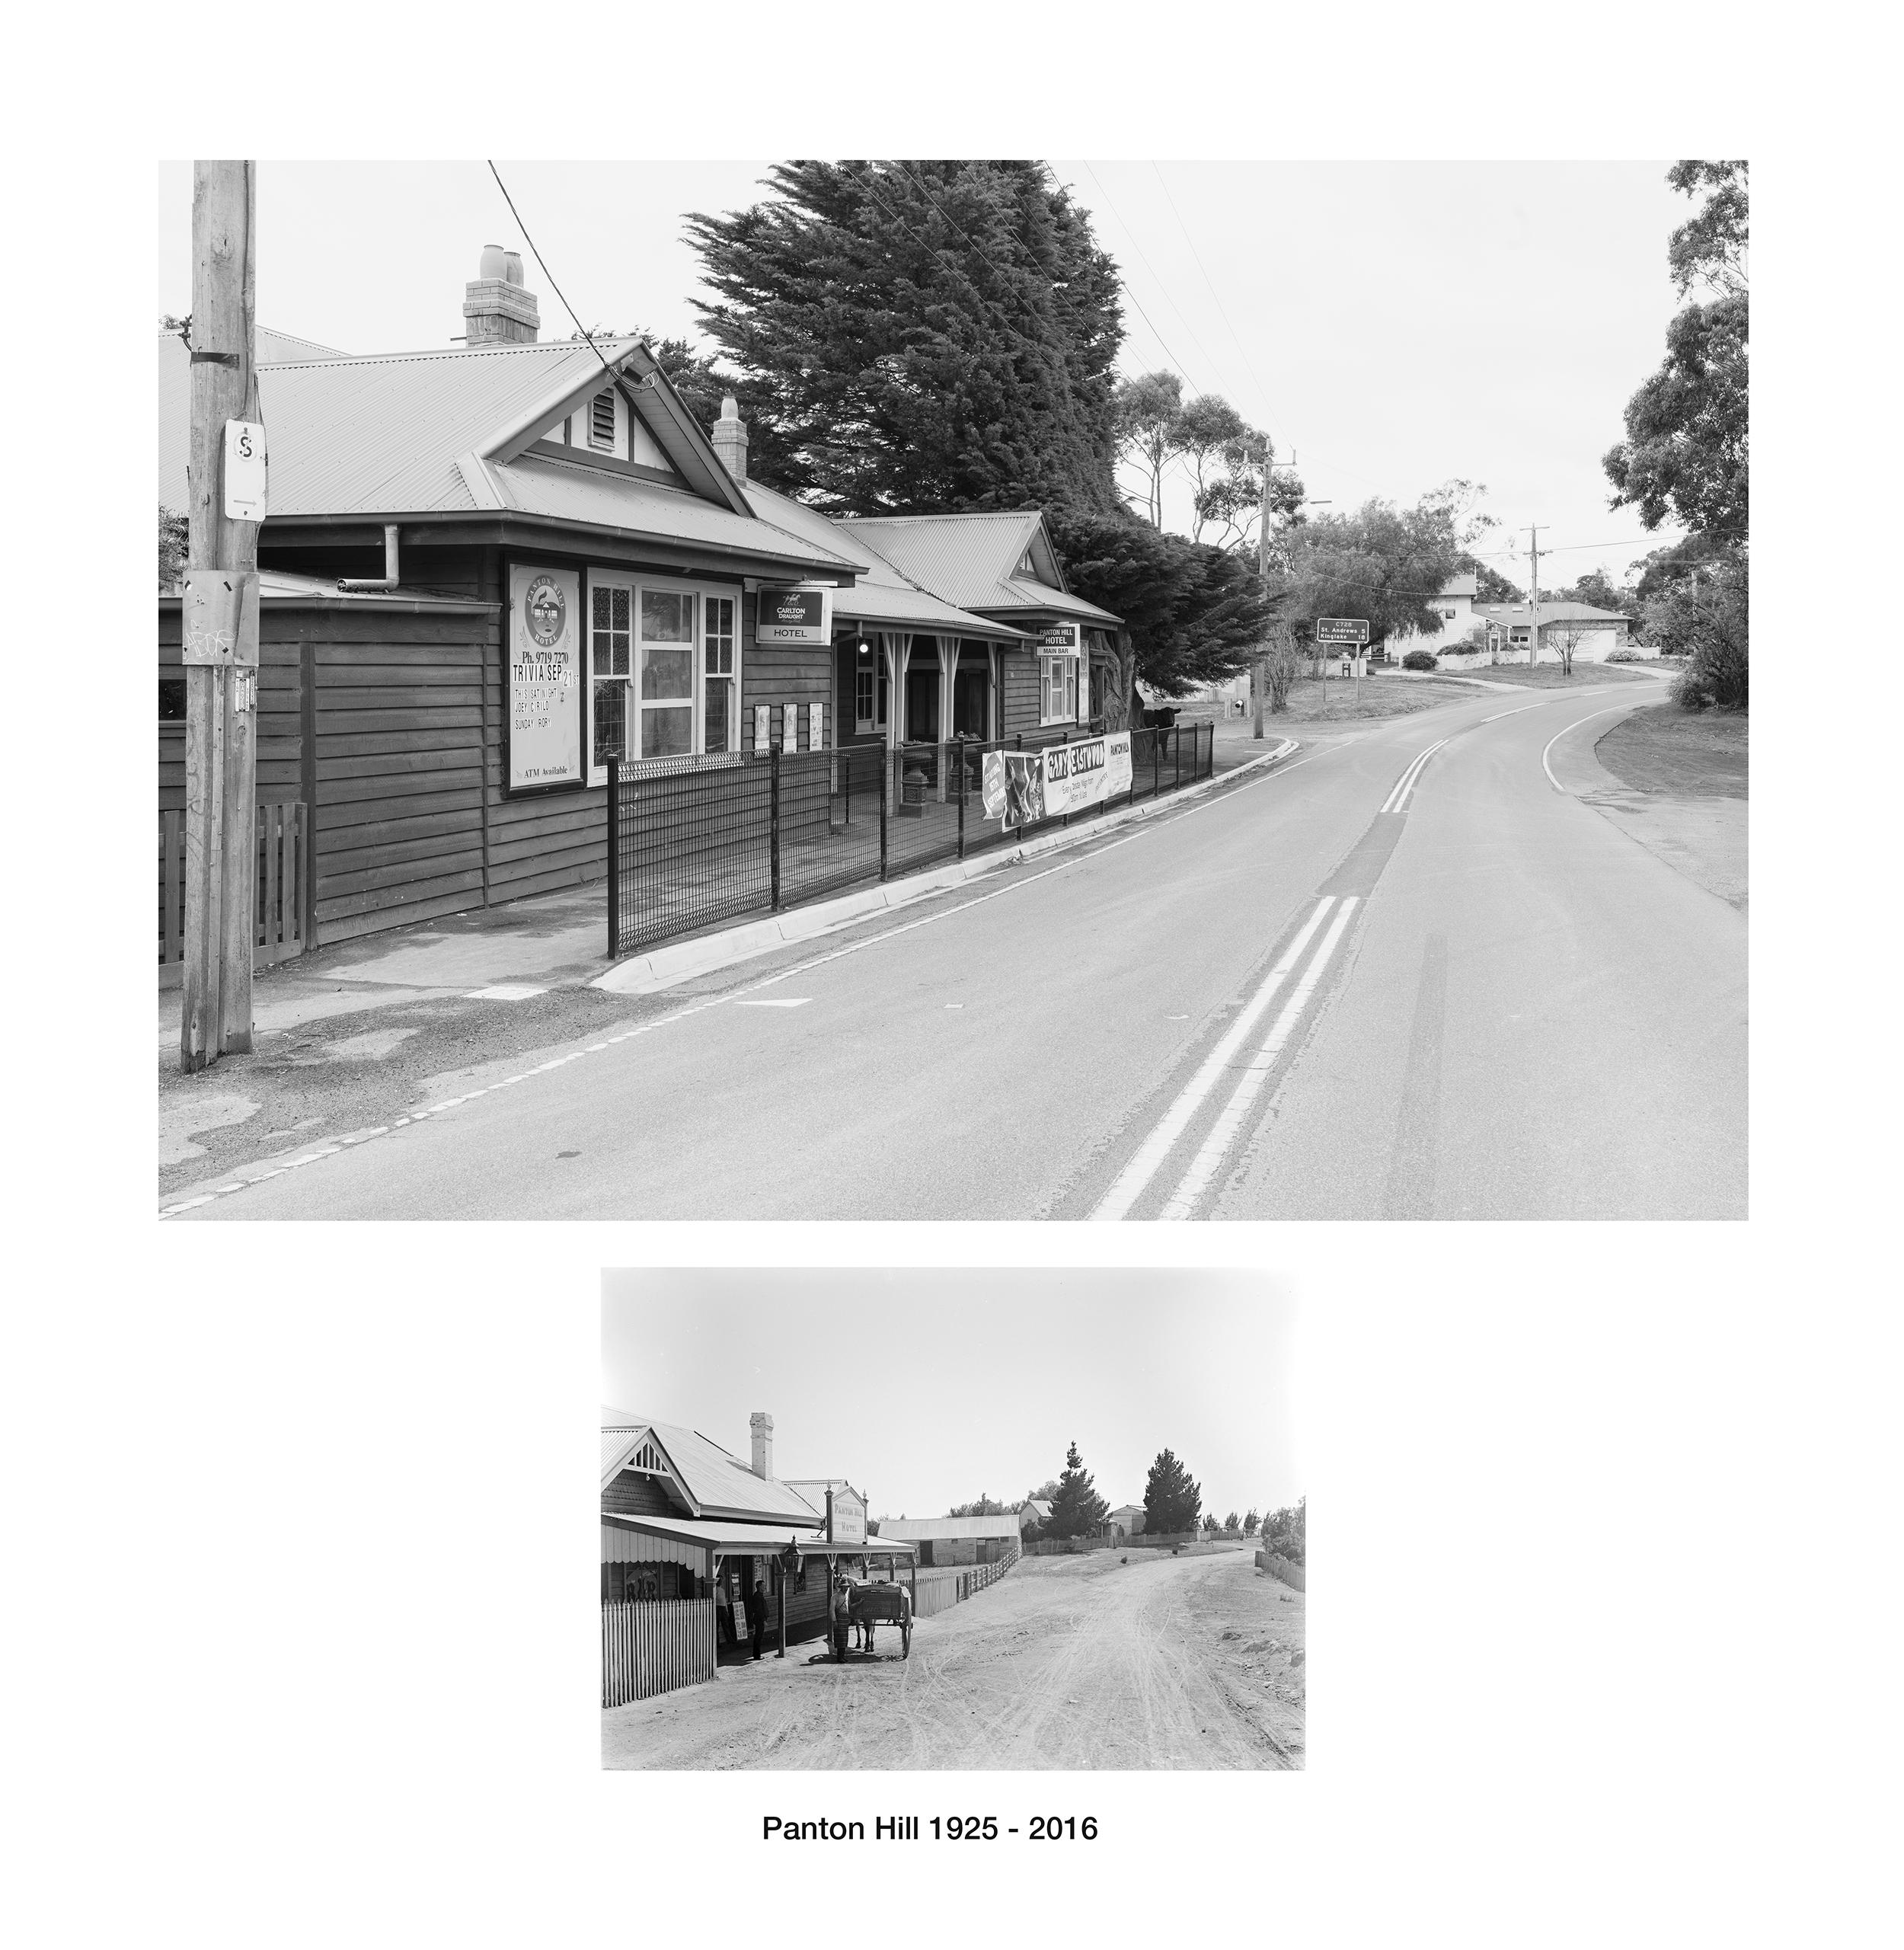 Panton Hill 1925 - 2016